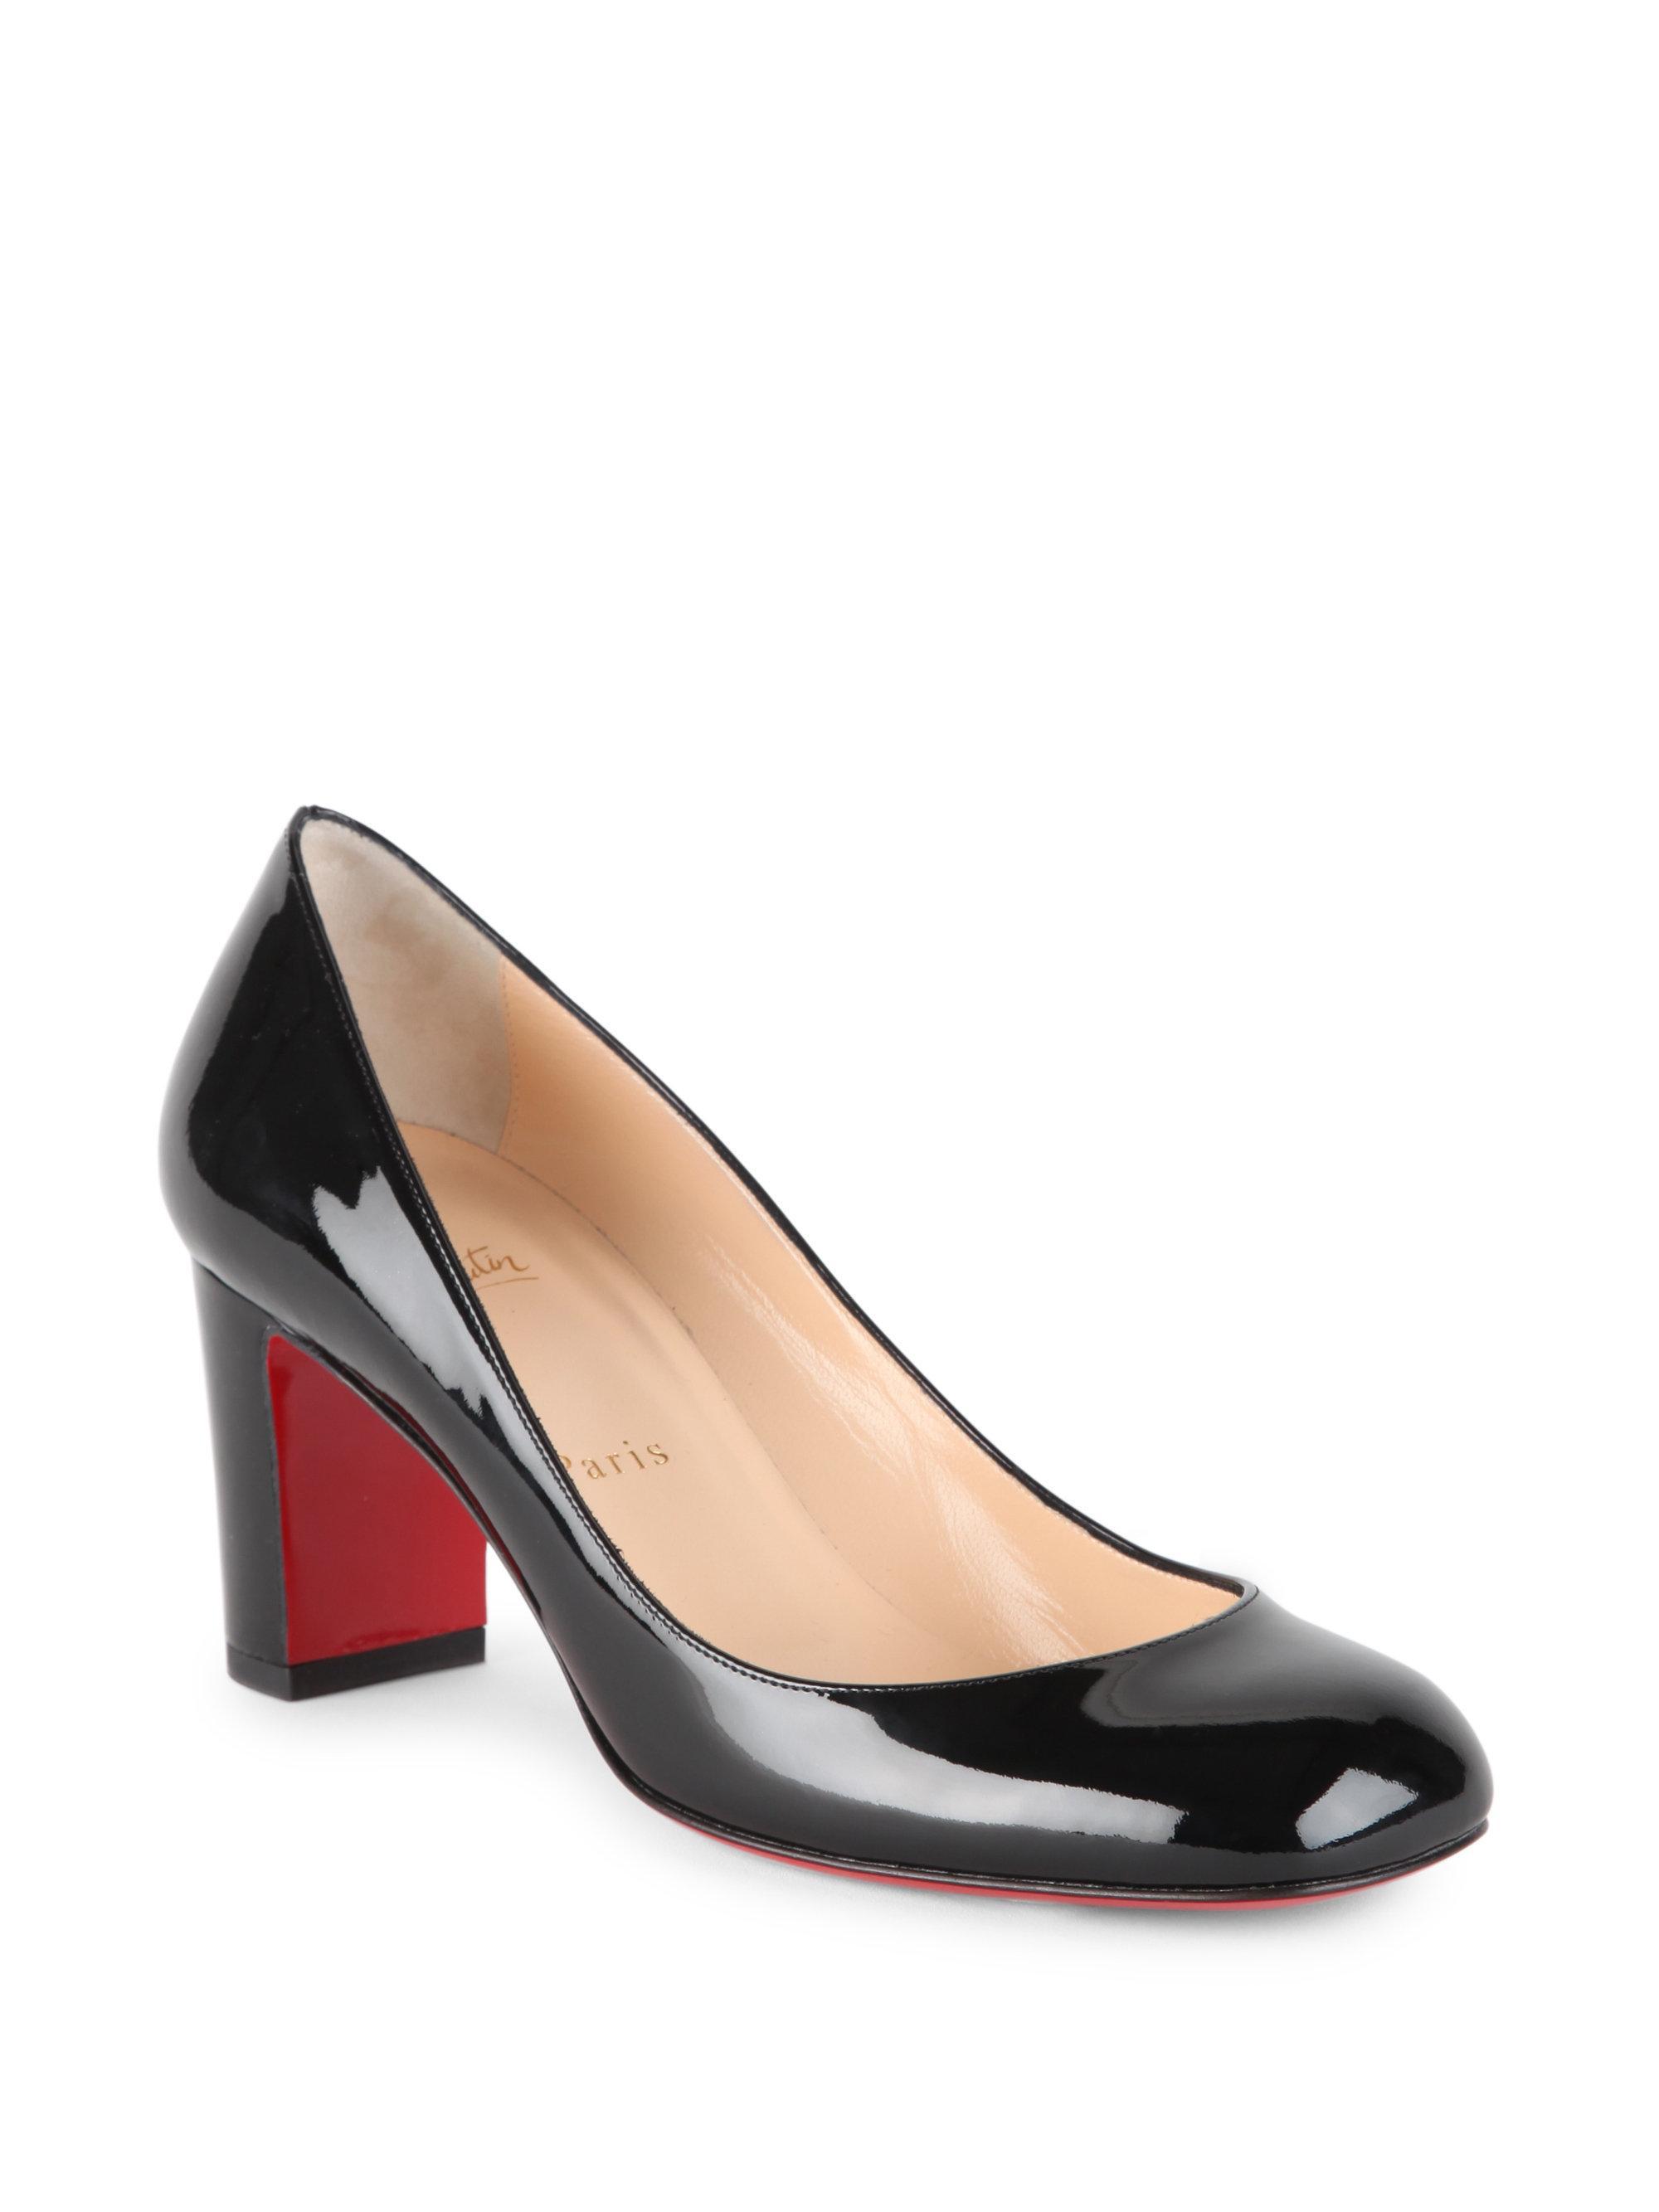 fbc2f6ef723 Christian Louboutin Cadrilla 70 Patent Leather Block Heel Pumps in ...